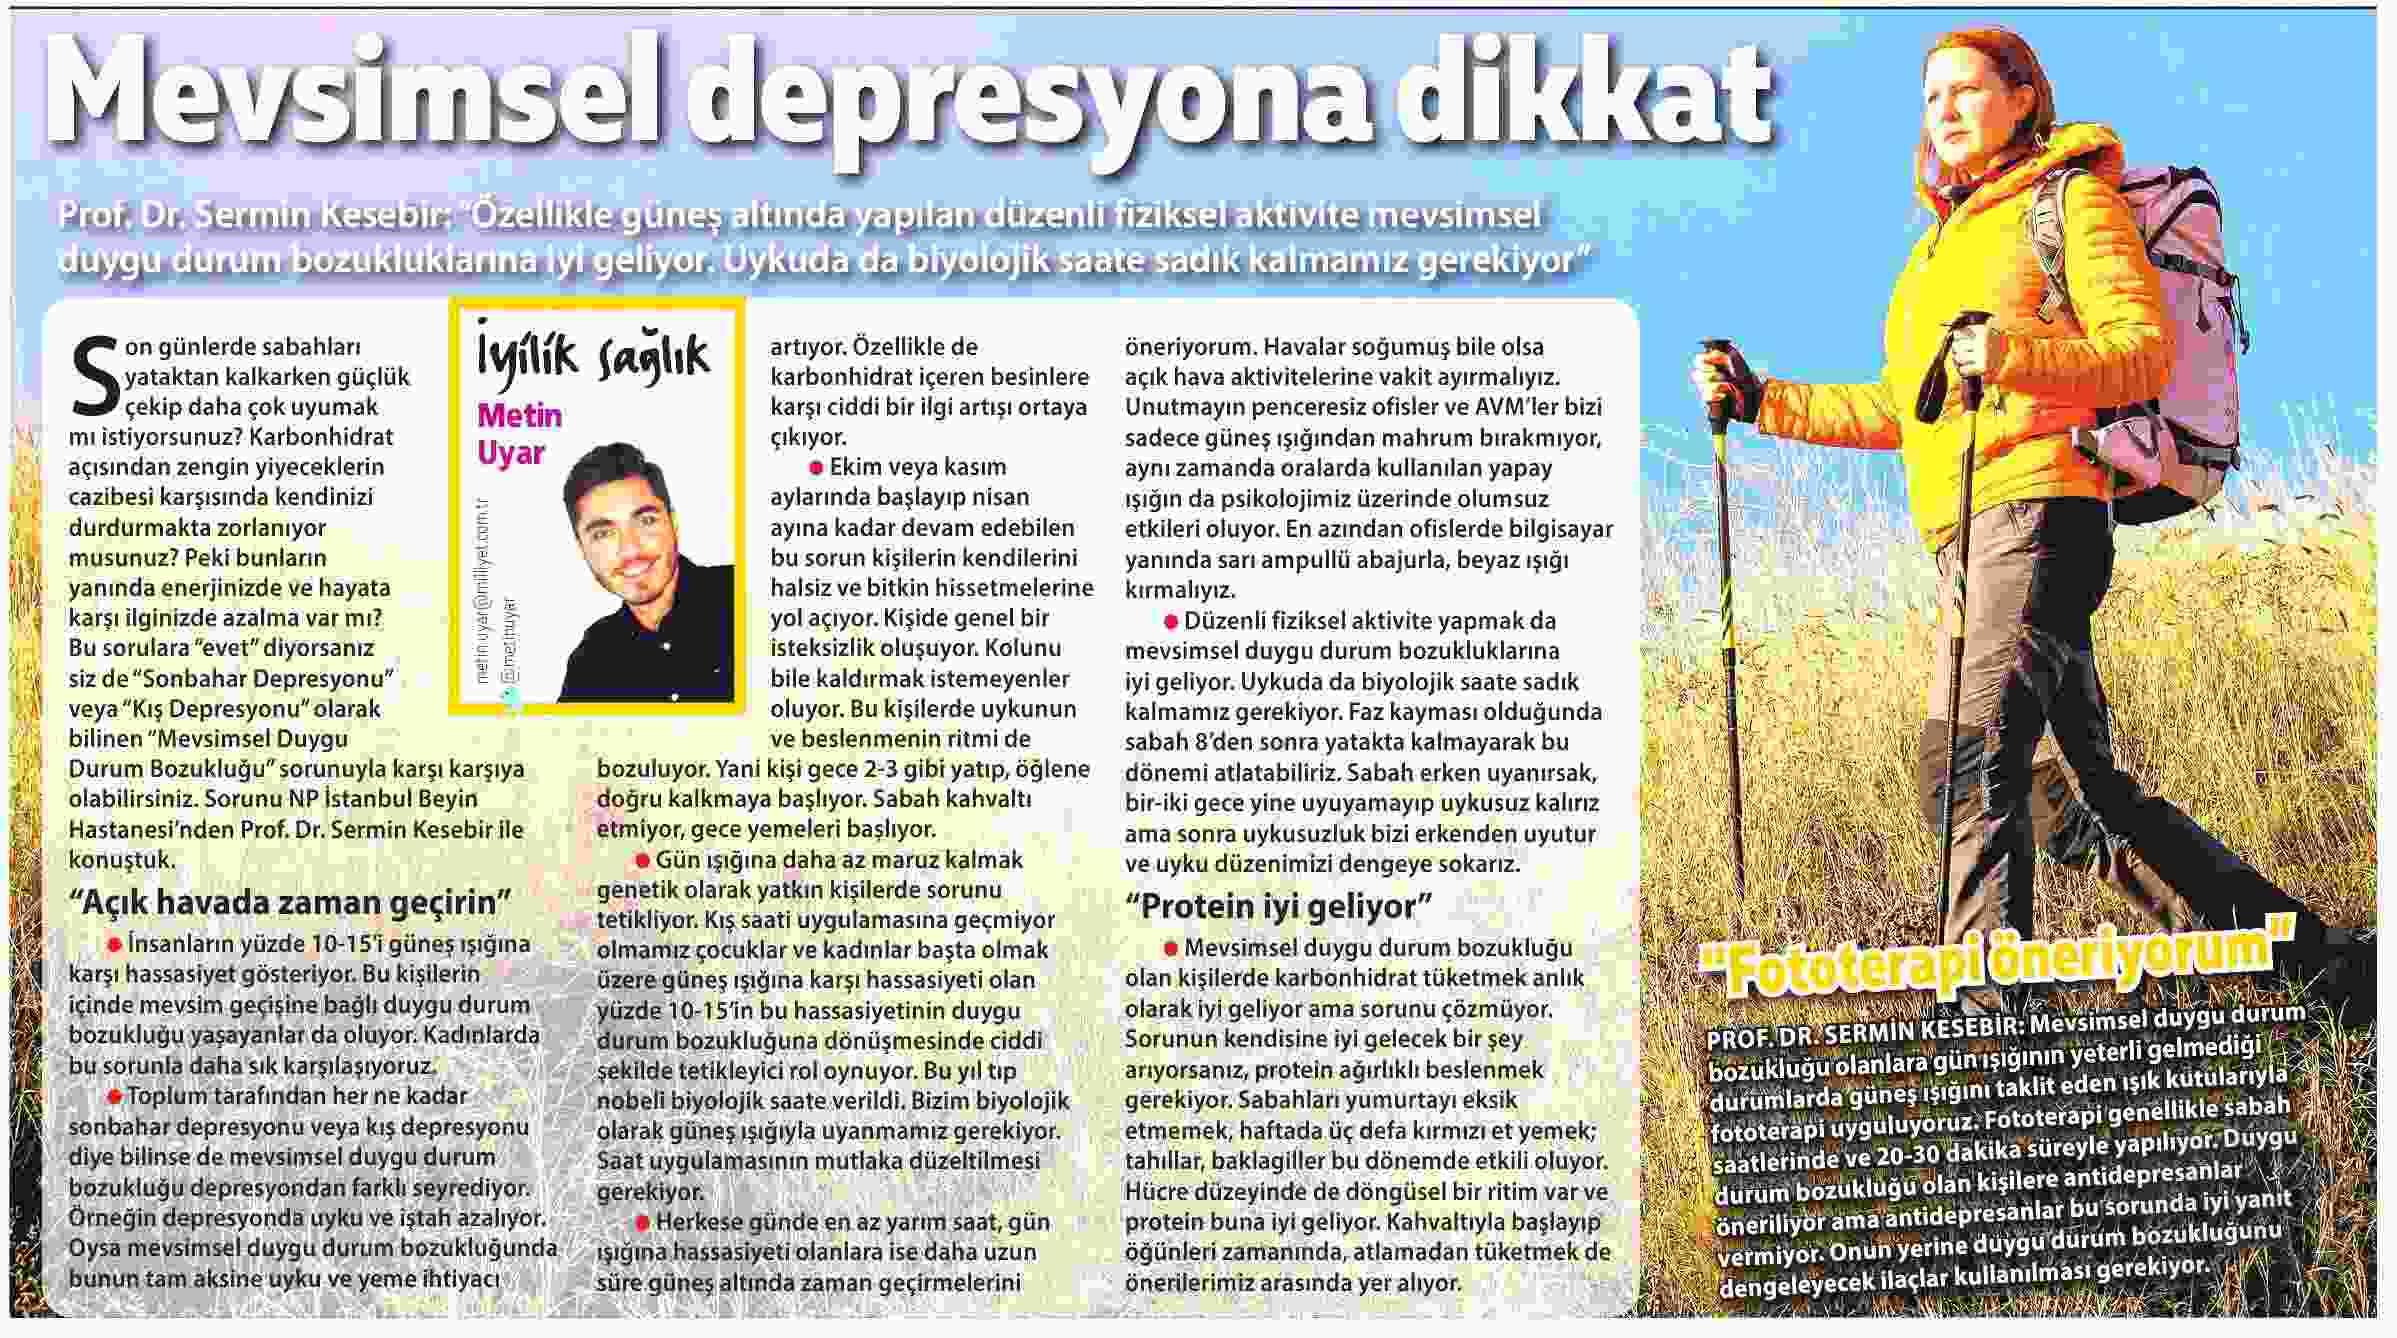 MEVSİMSEL DEPRESYONA DİKKAT